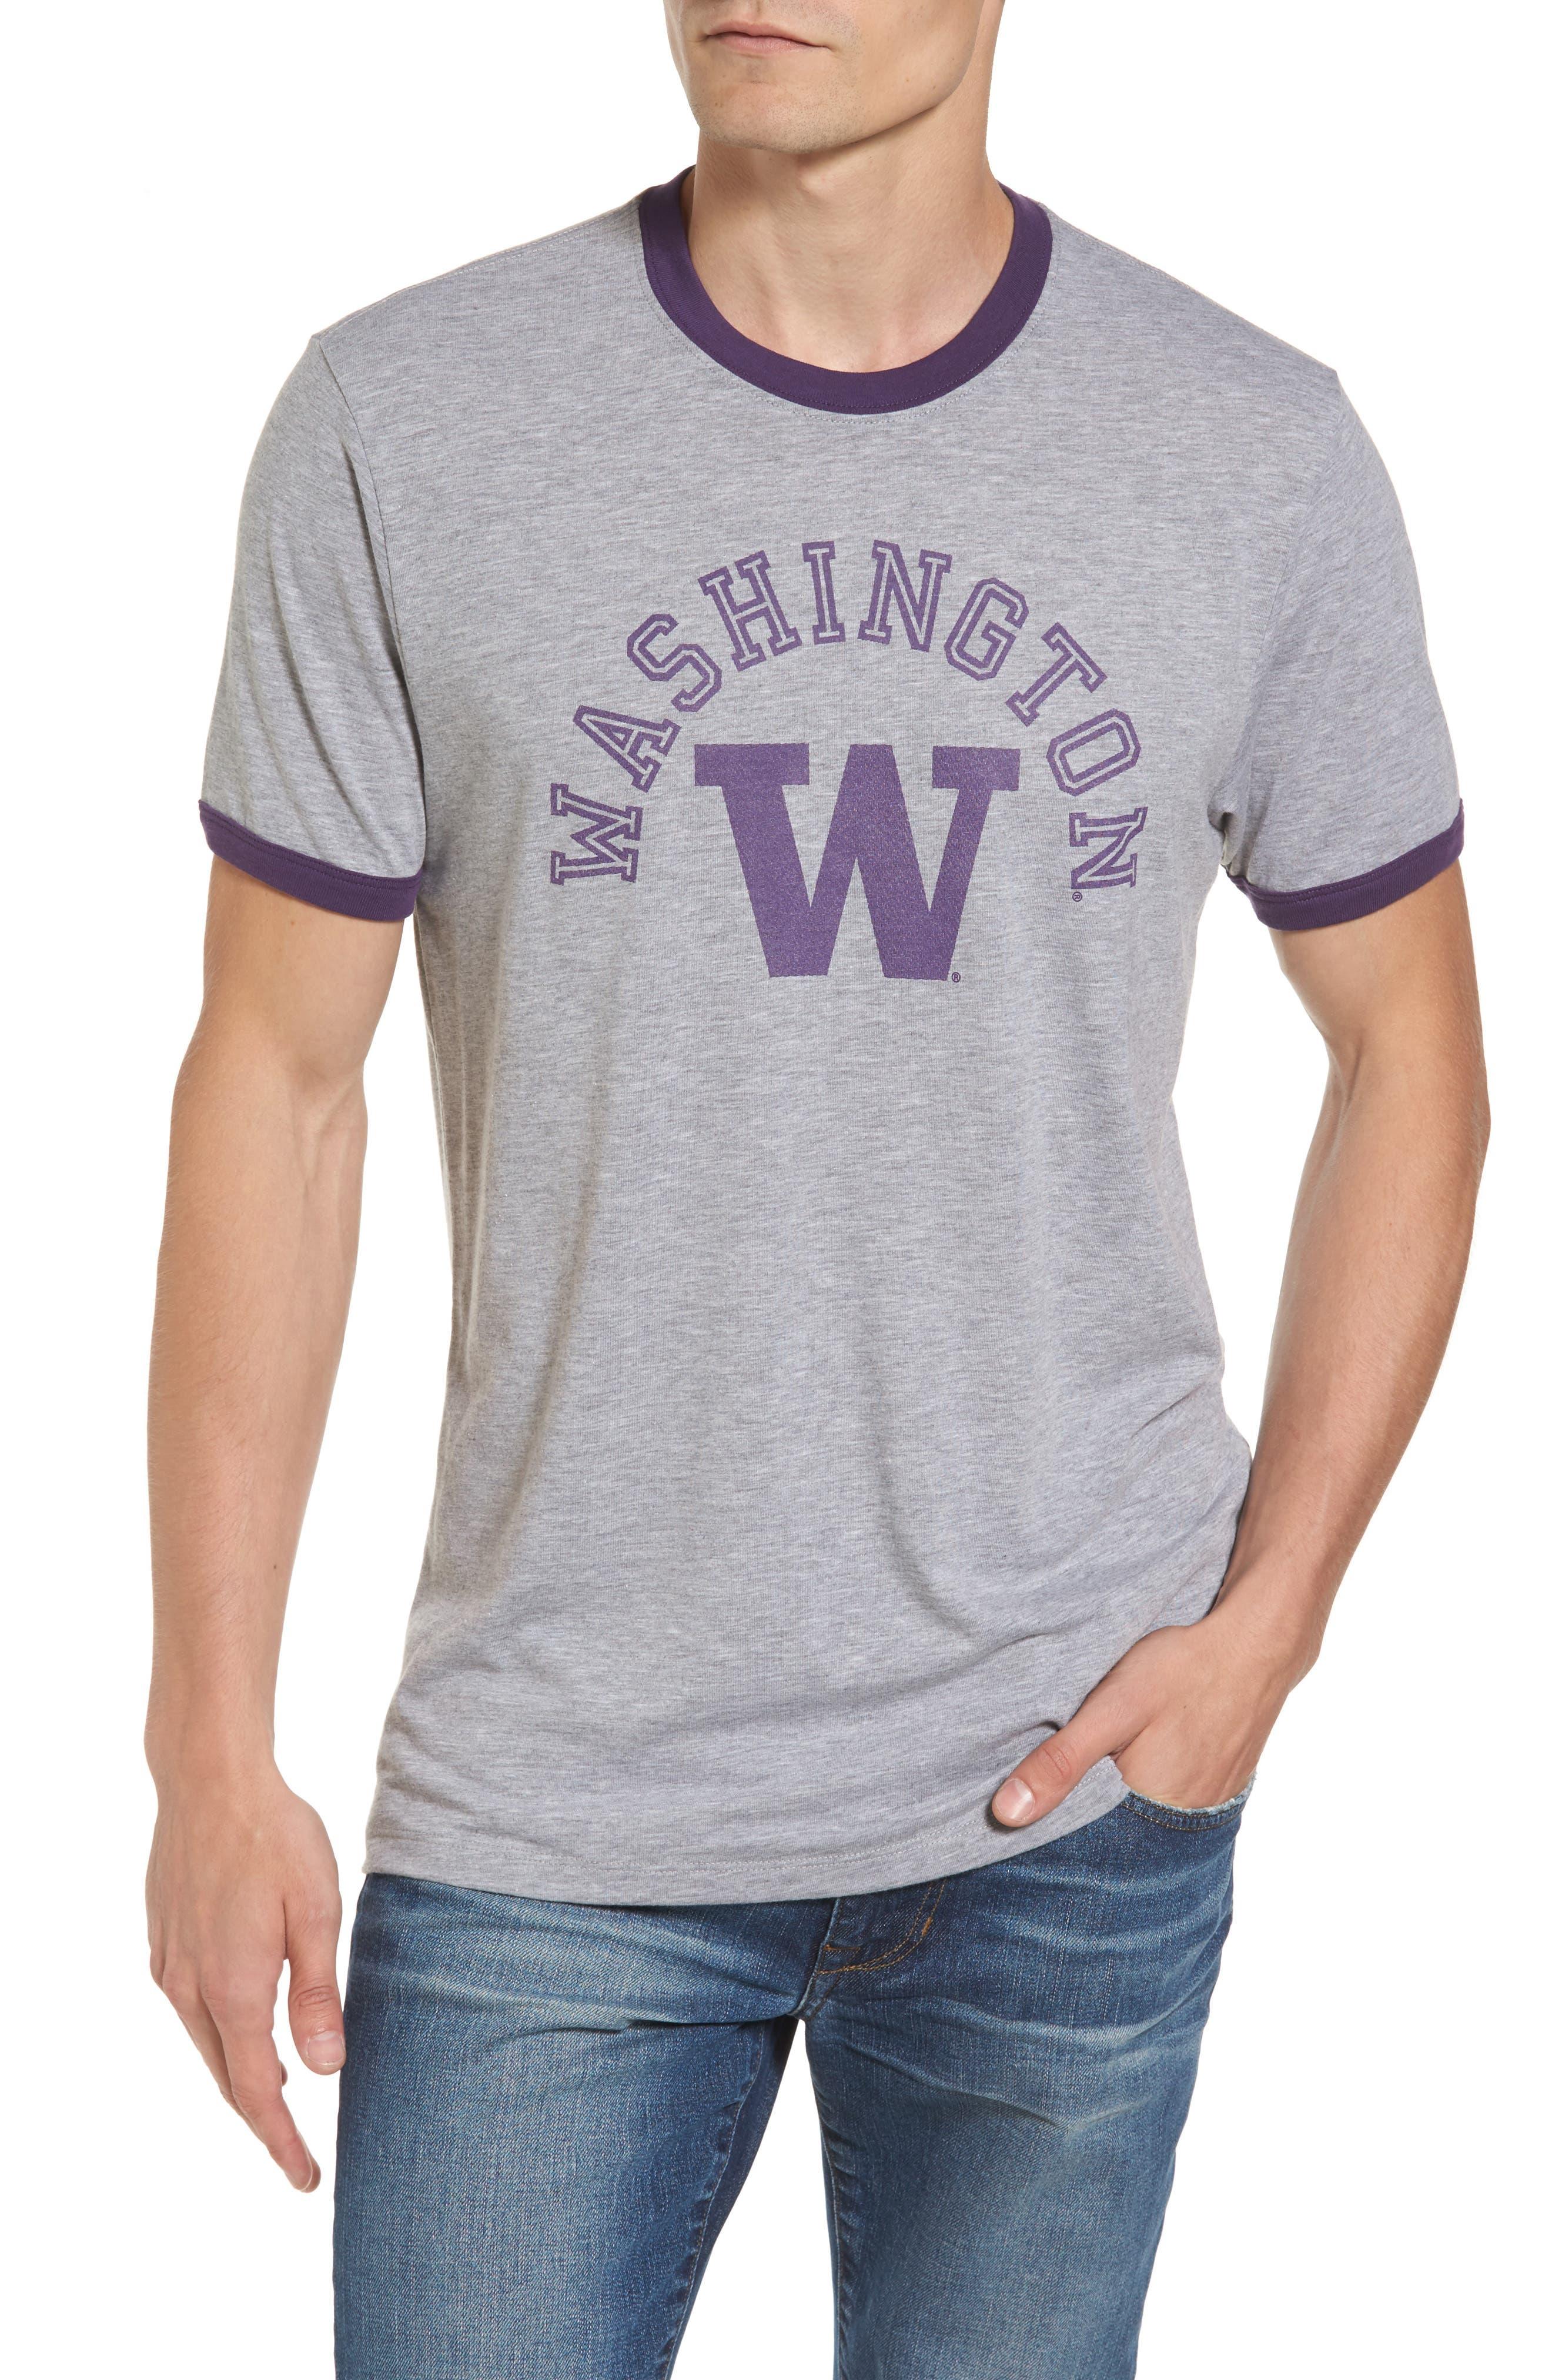 Main Image - '47 University of Washington Huskies Ringer T-Shirt